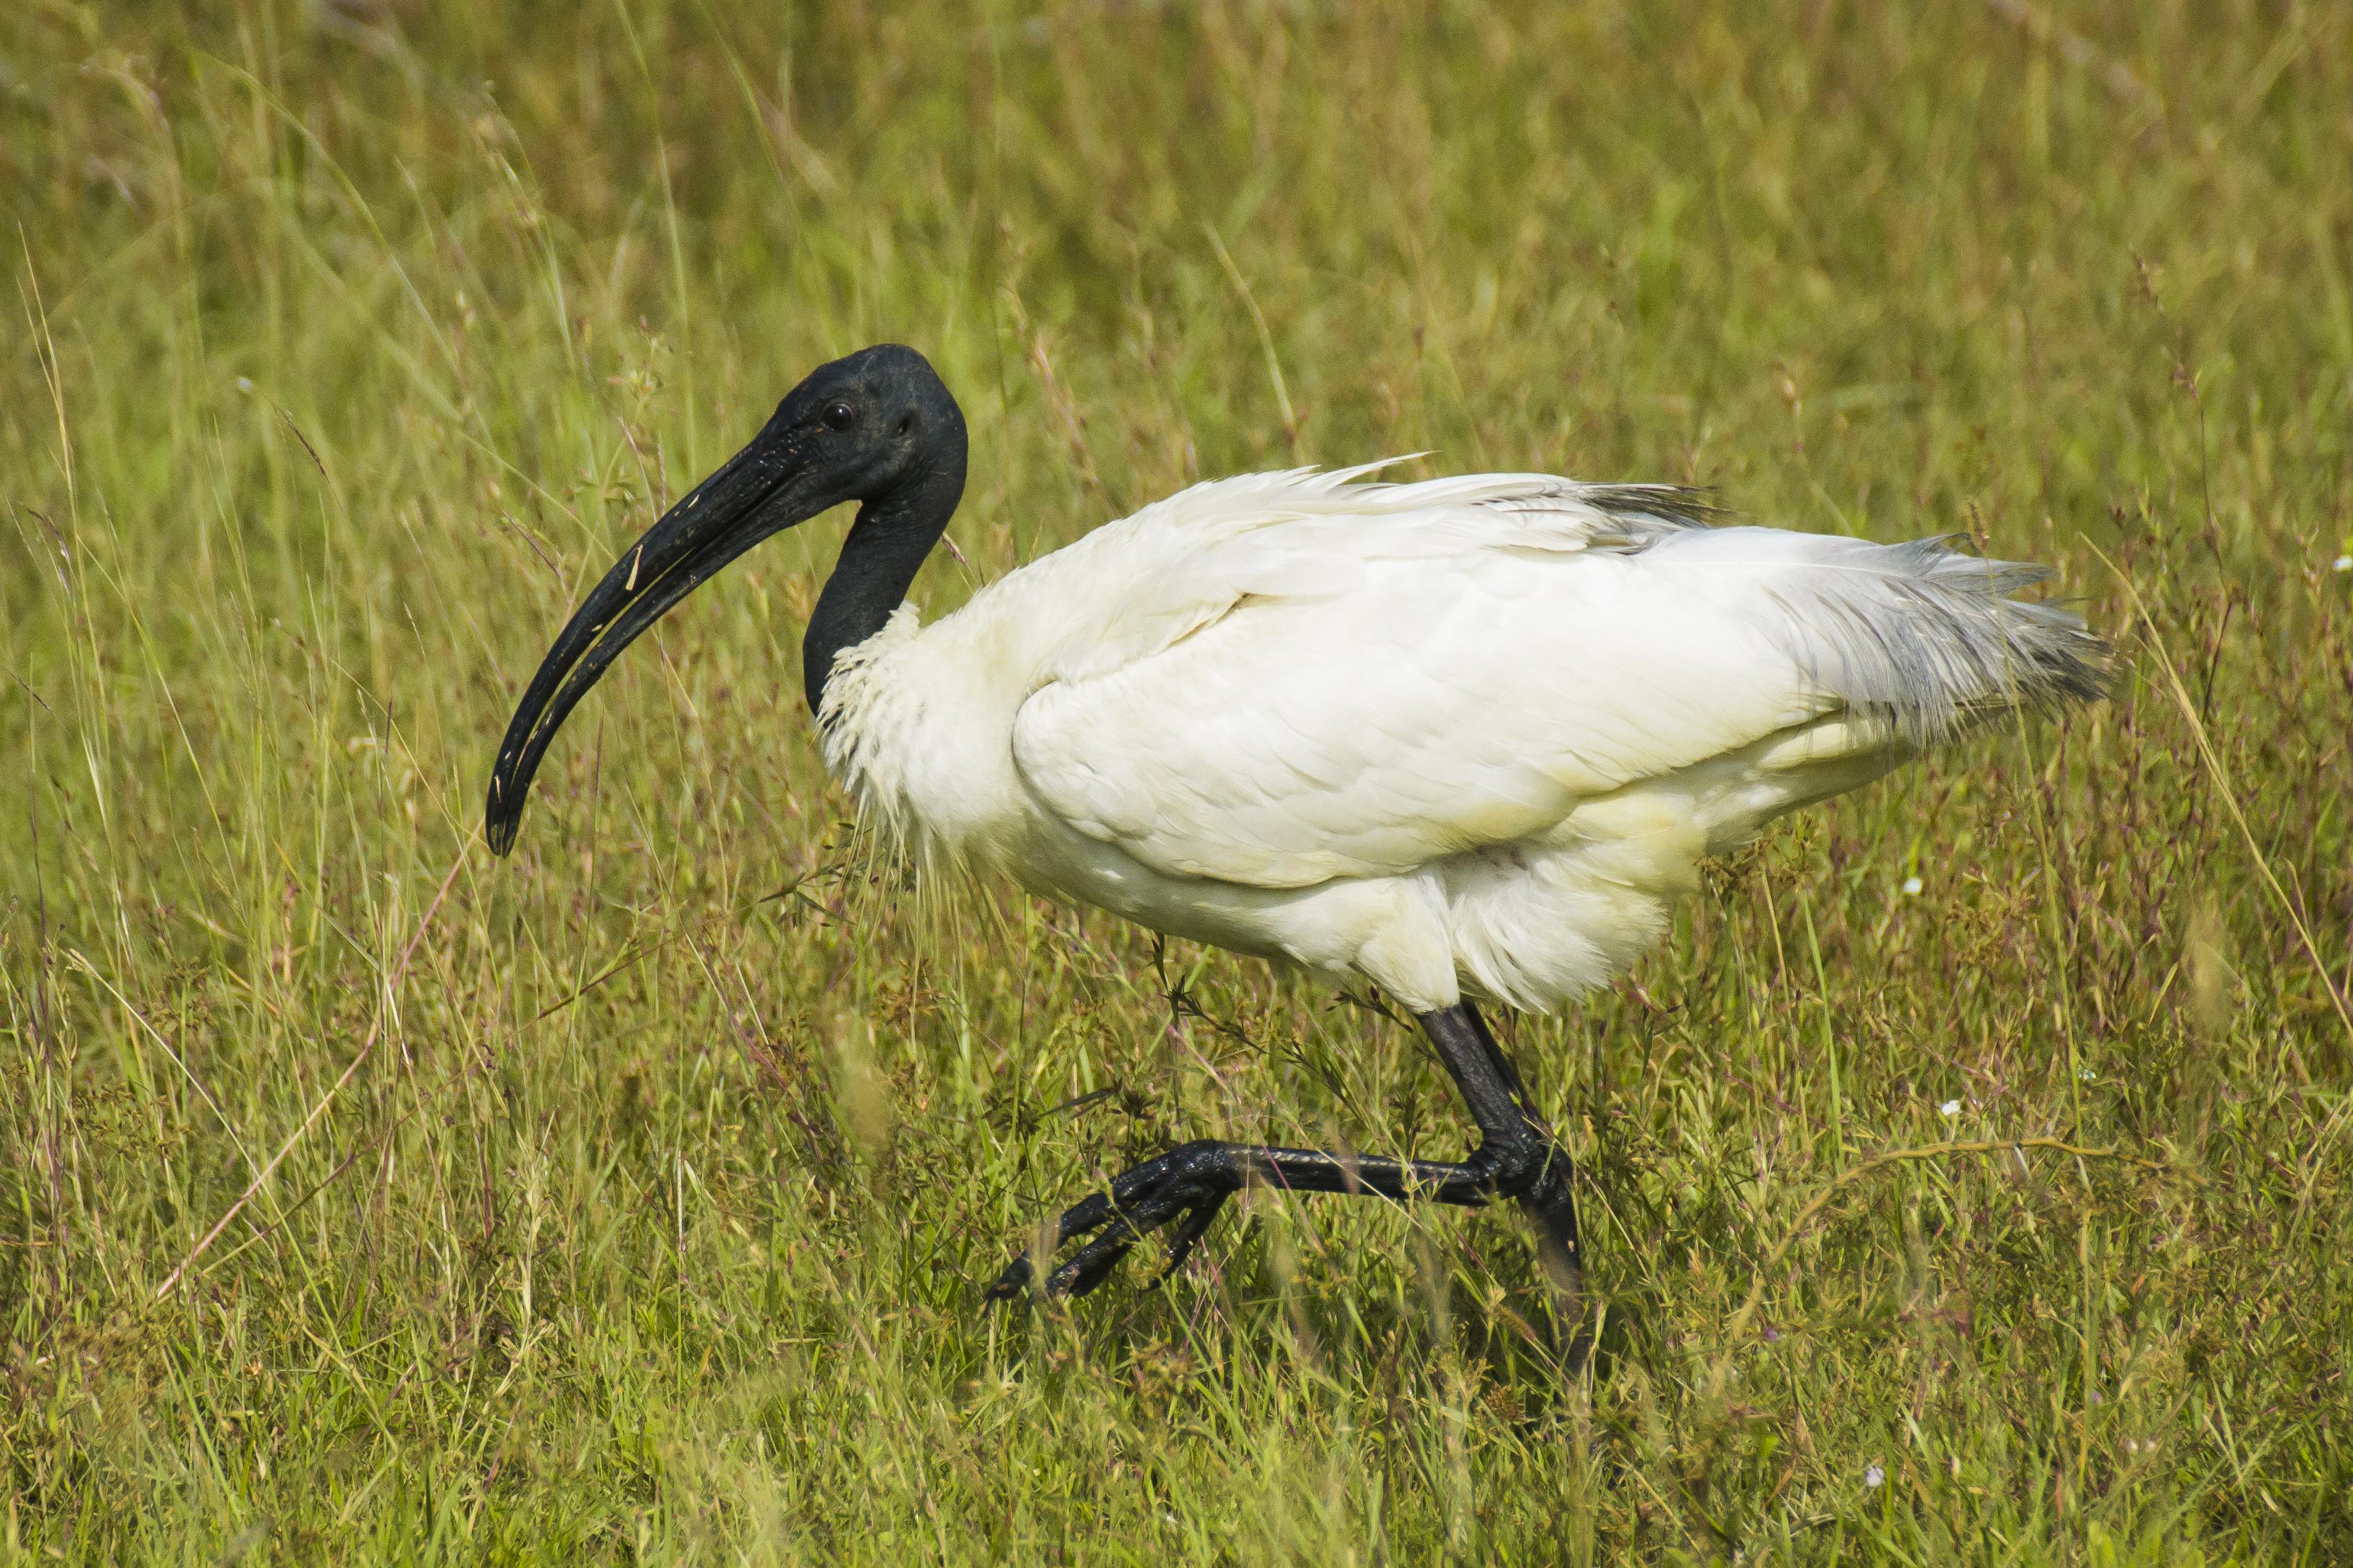 Black-headed ibis - Wikipedia